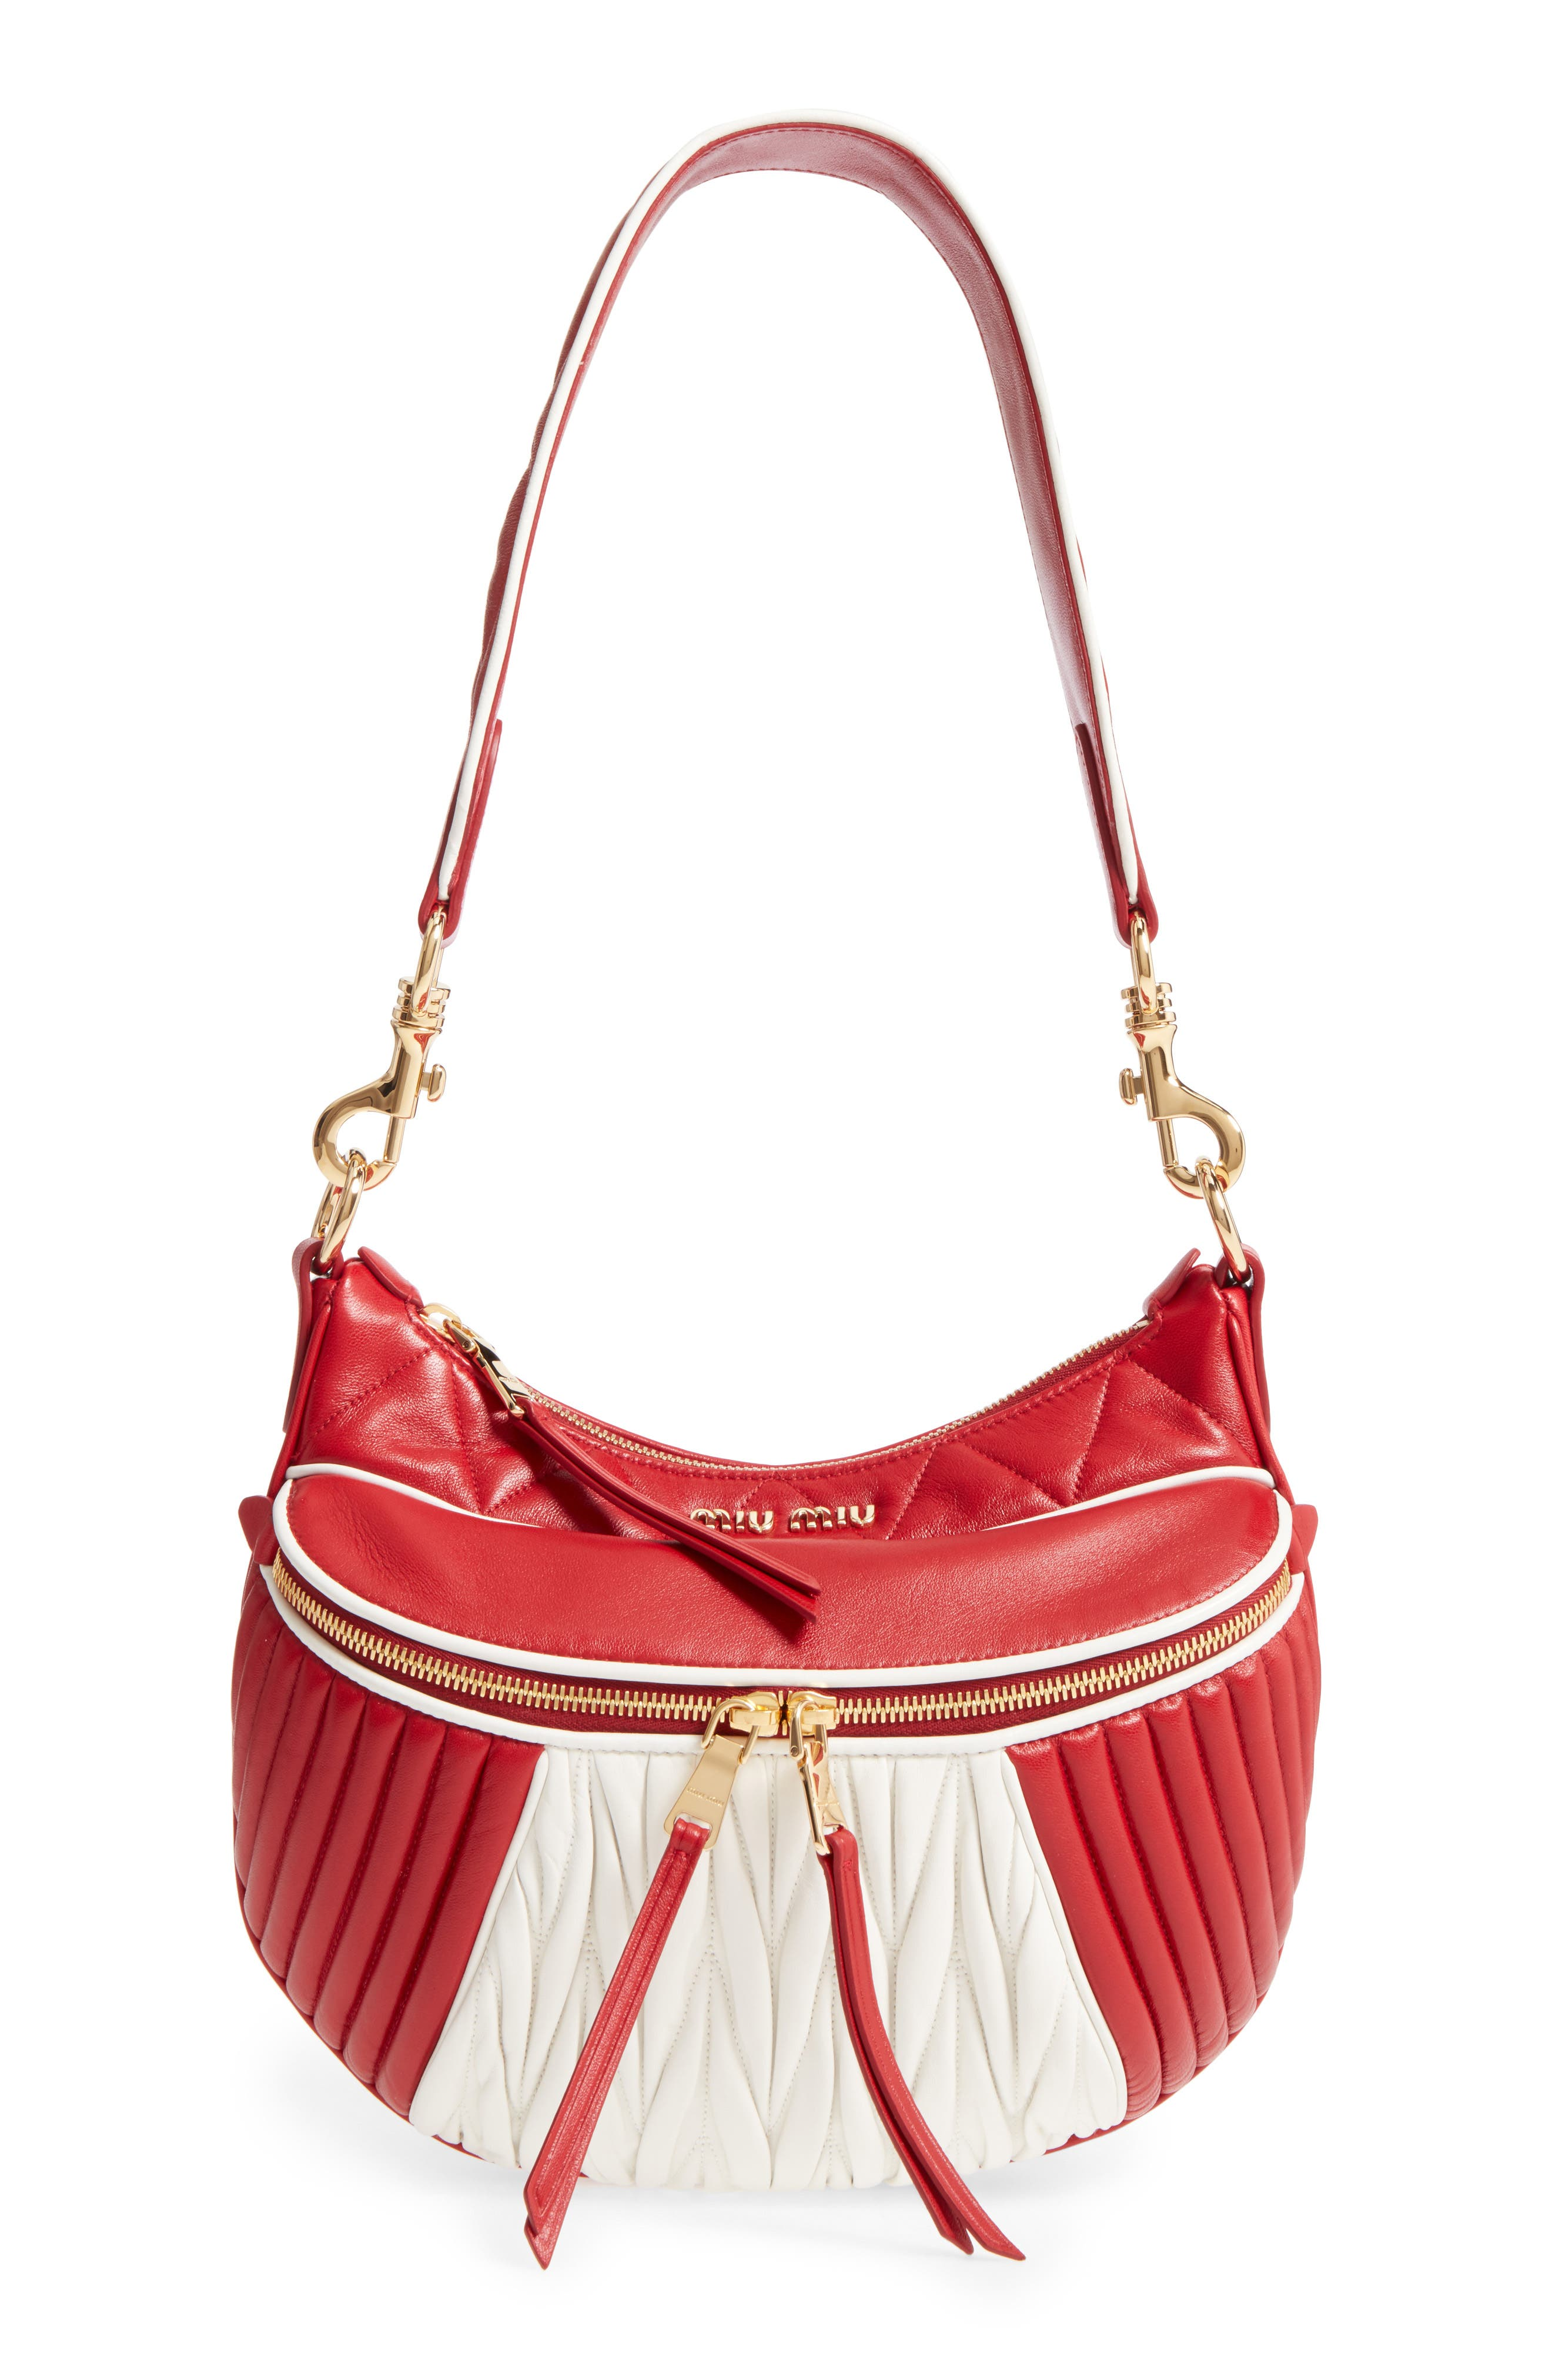 Small Rider Matelassé Leather Shoulder Bag,                         Main,                         color, Fuoco/ Bianco